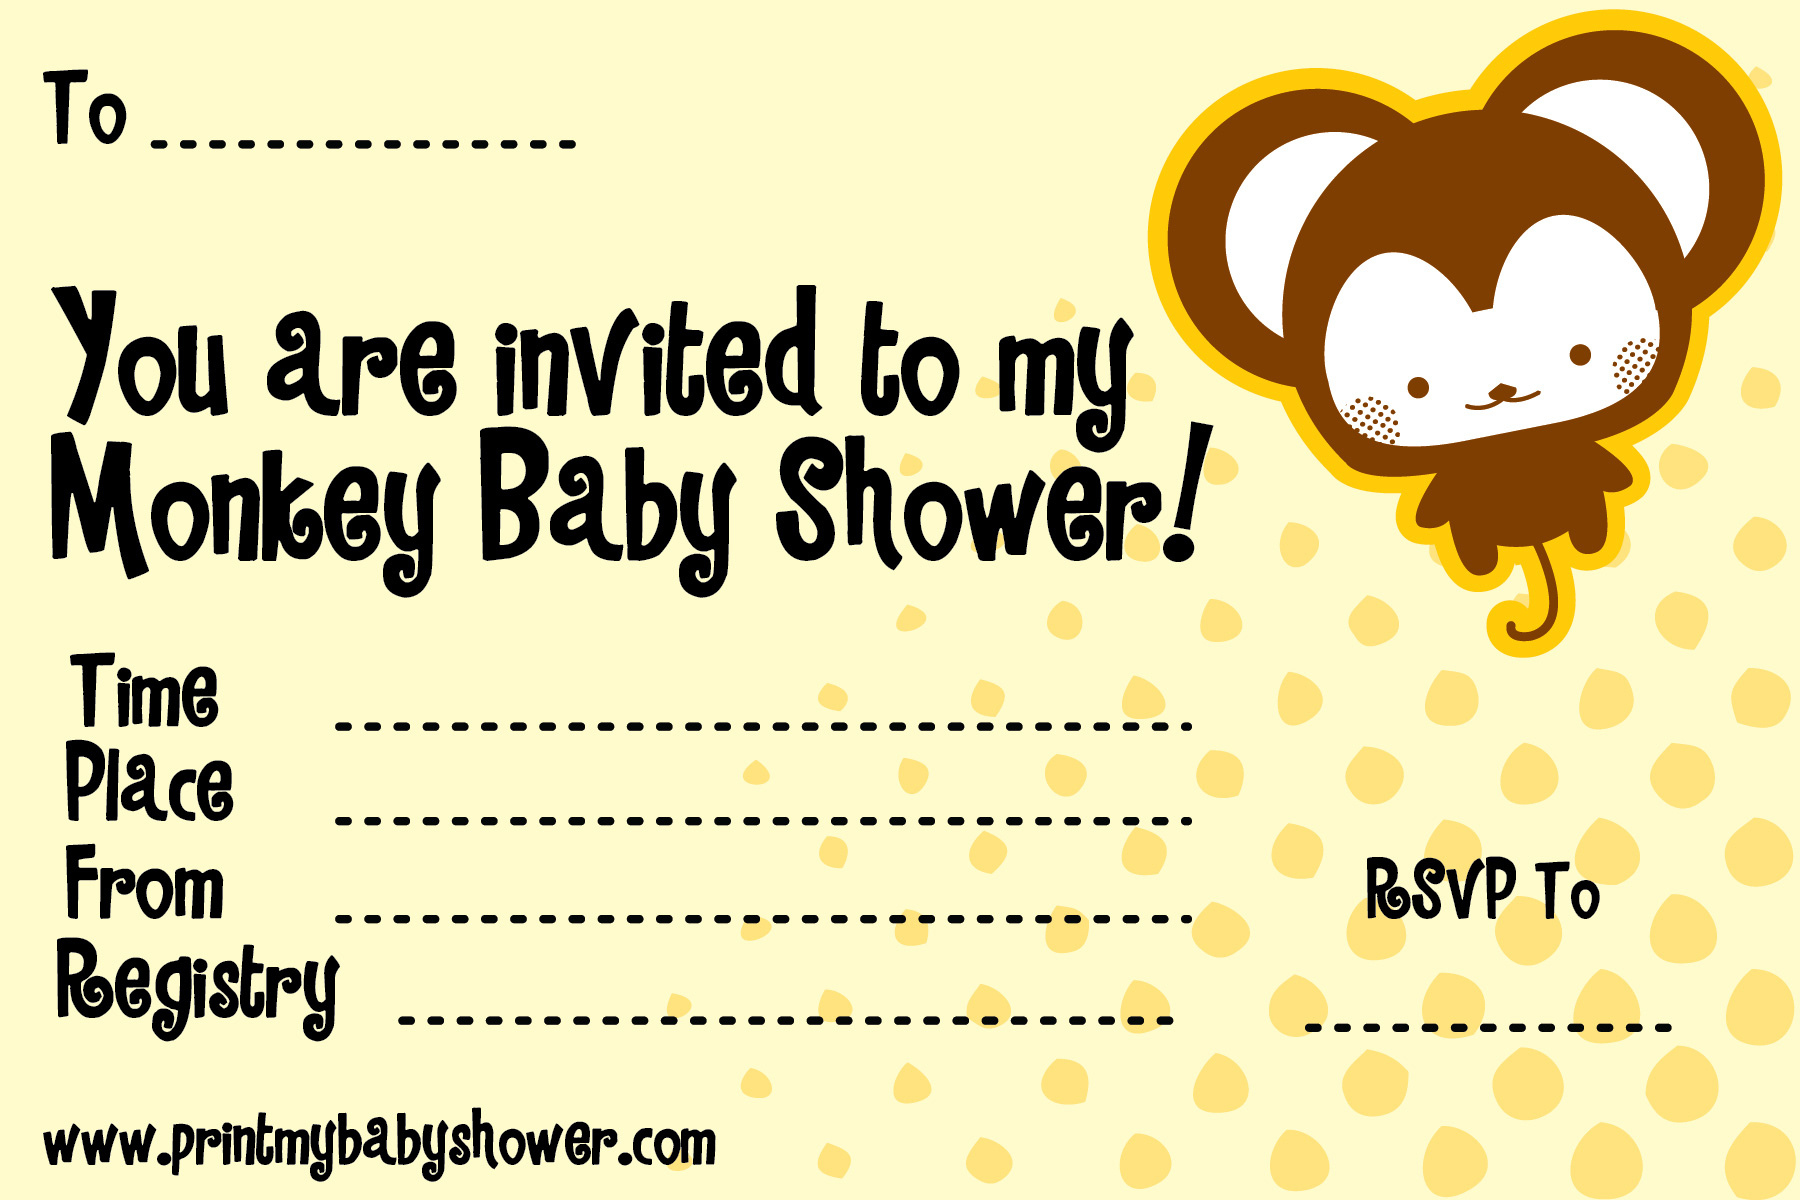 Photo : Free Baby Shower Invitation Templates Image - Free Printable Monkey Girl Baby Shower Invitations